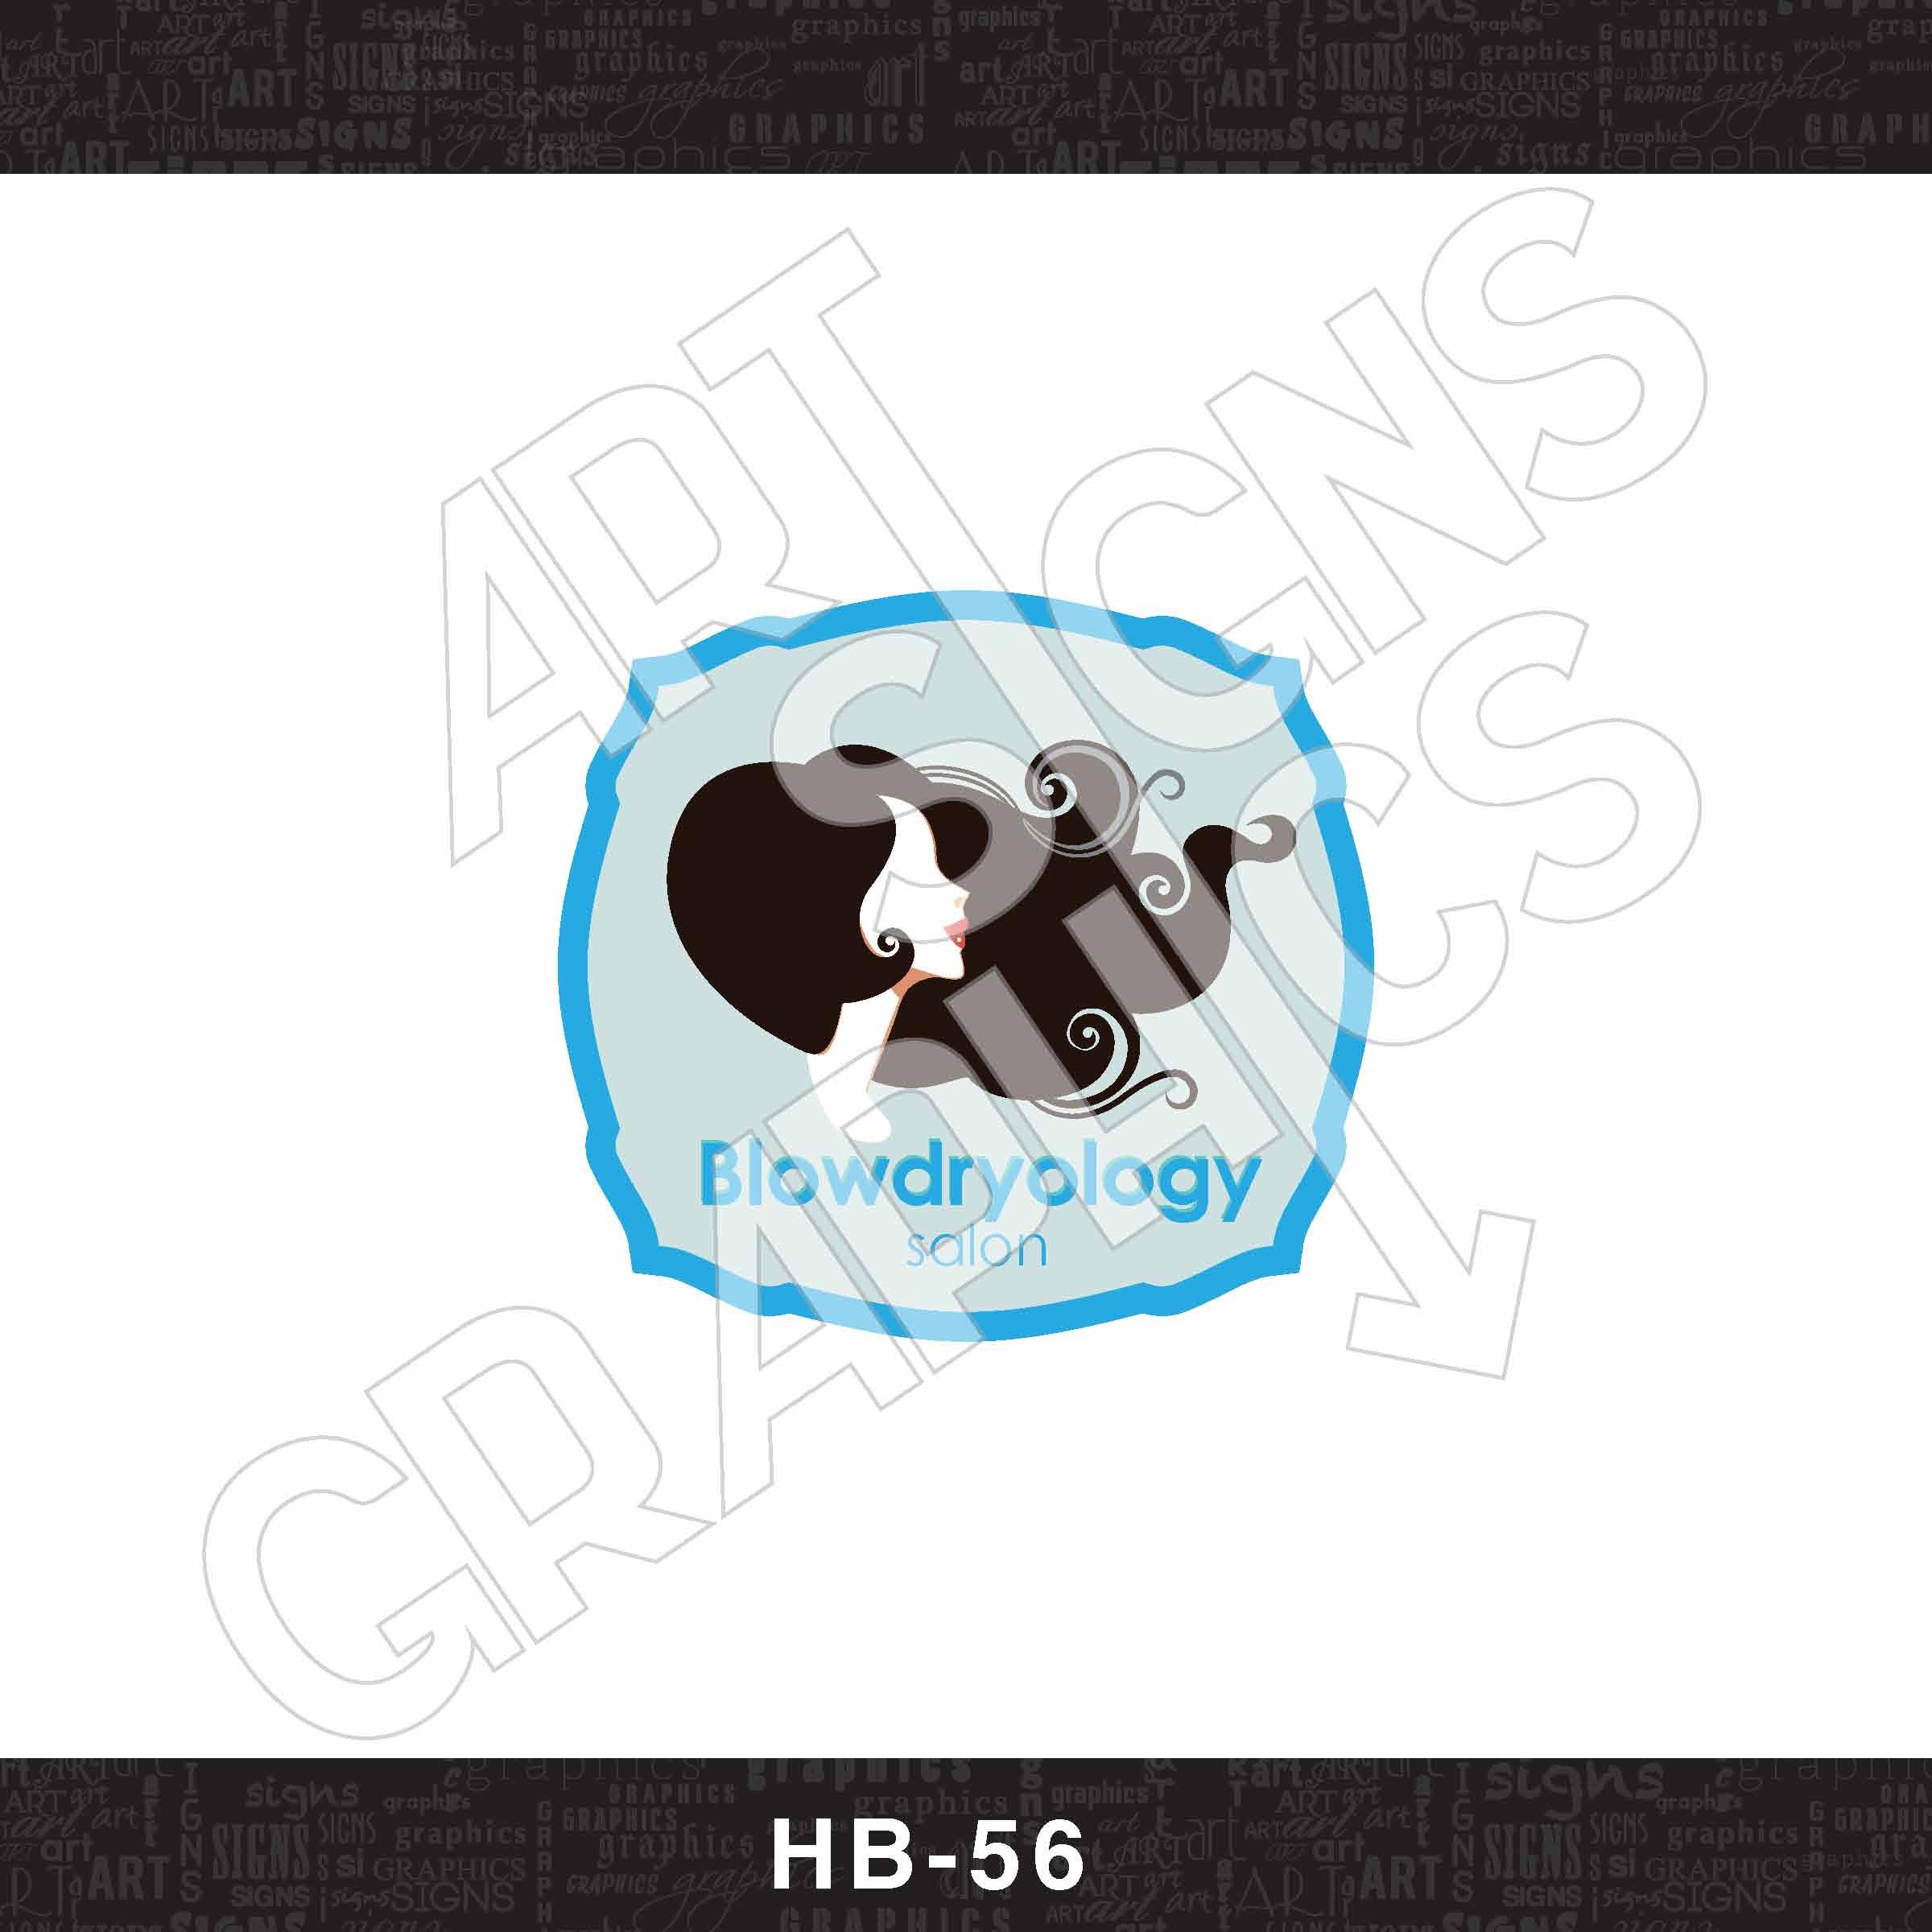 HB_56.jpg